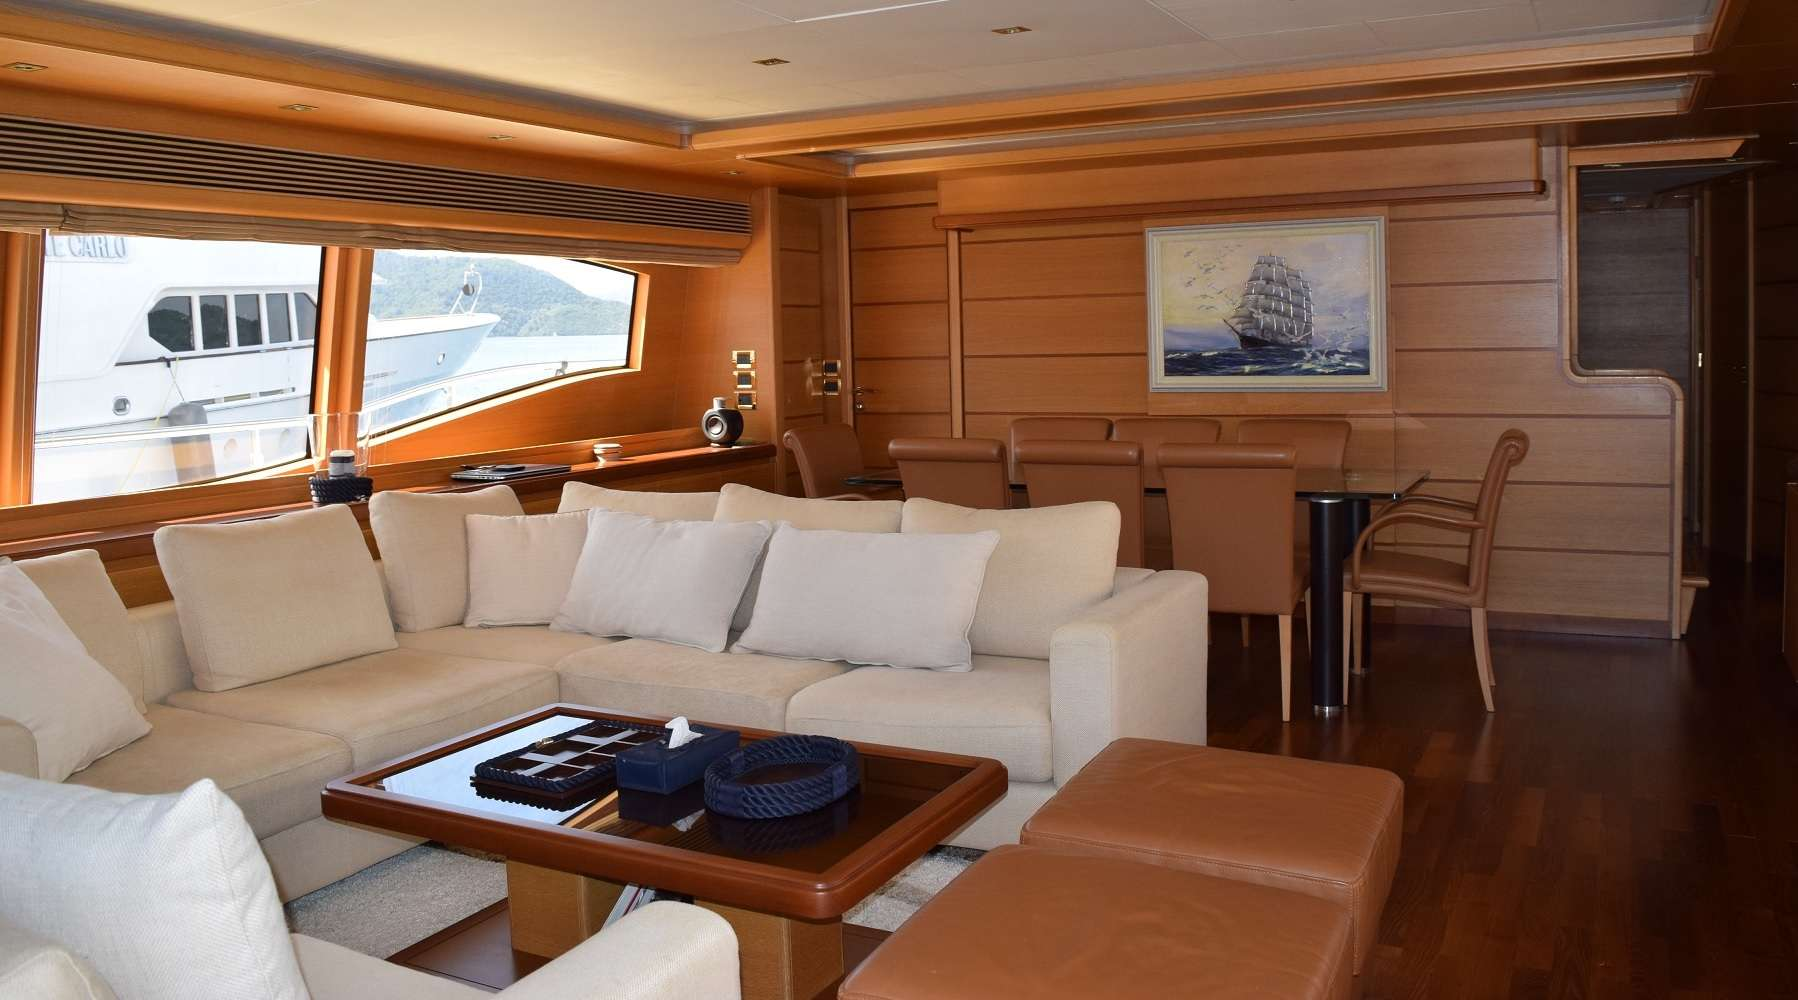 SEA LION II yacht image # 10